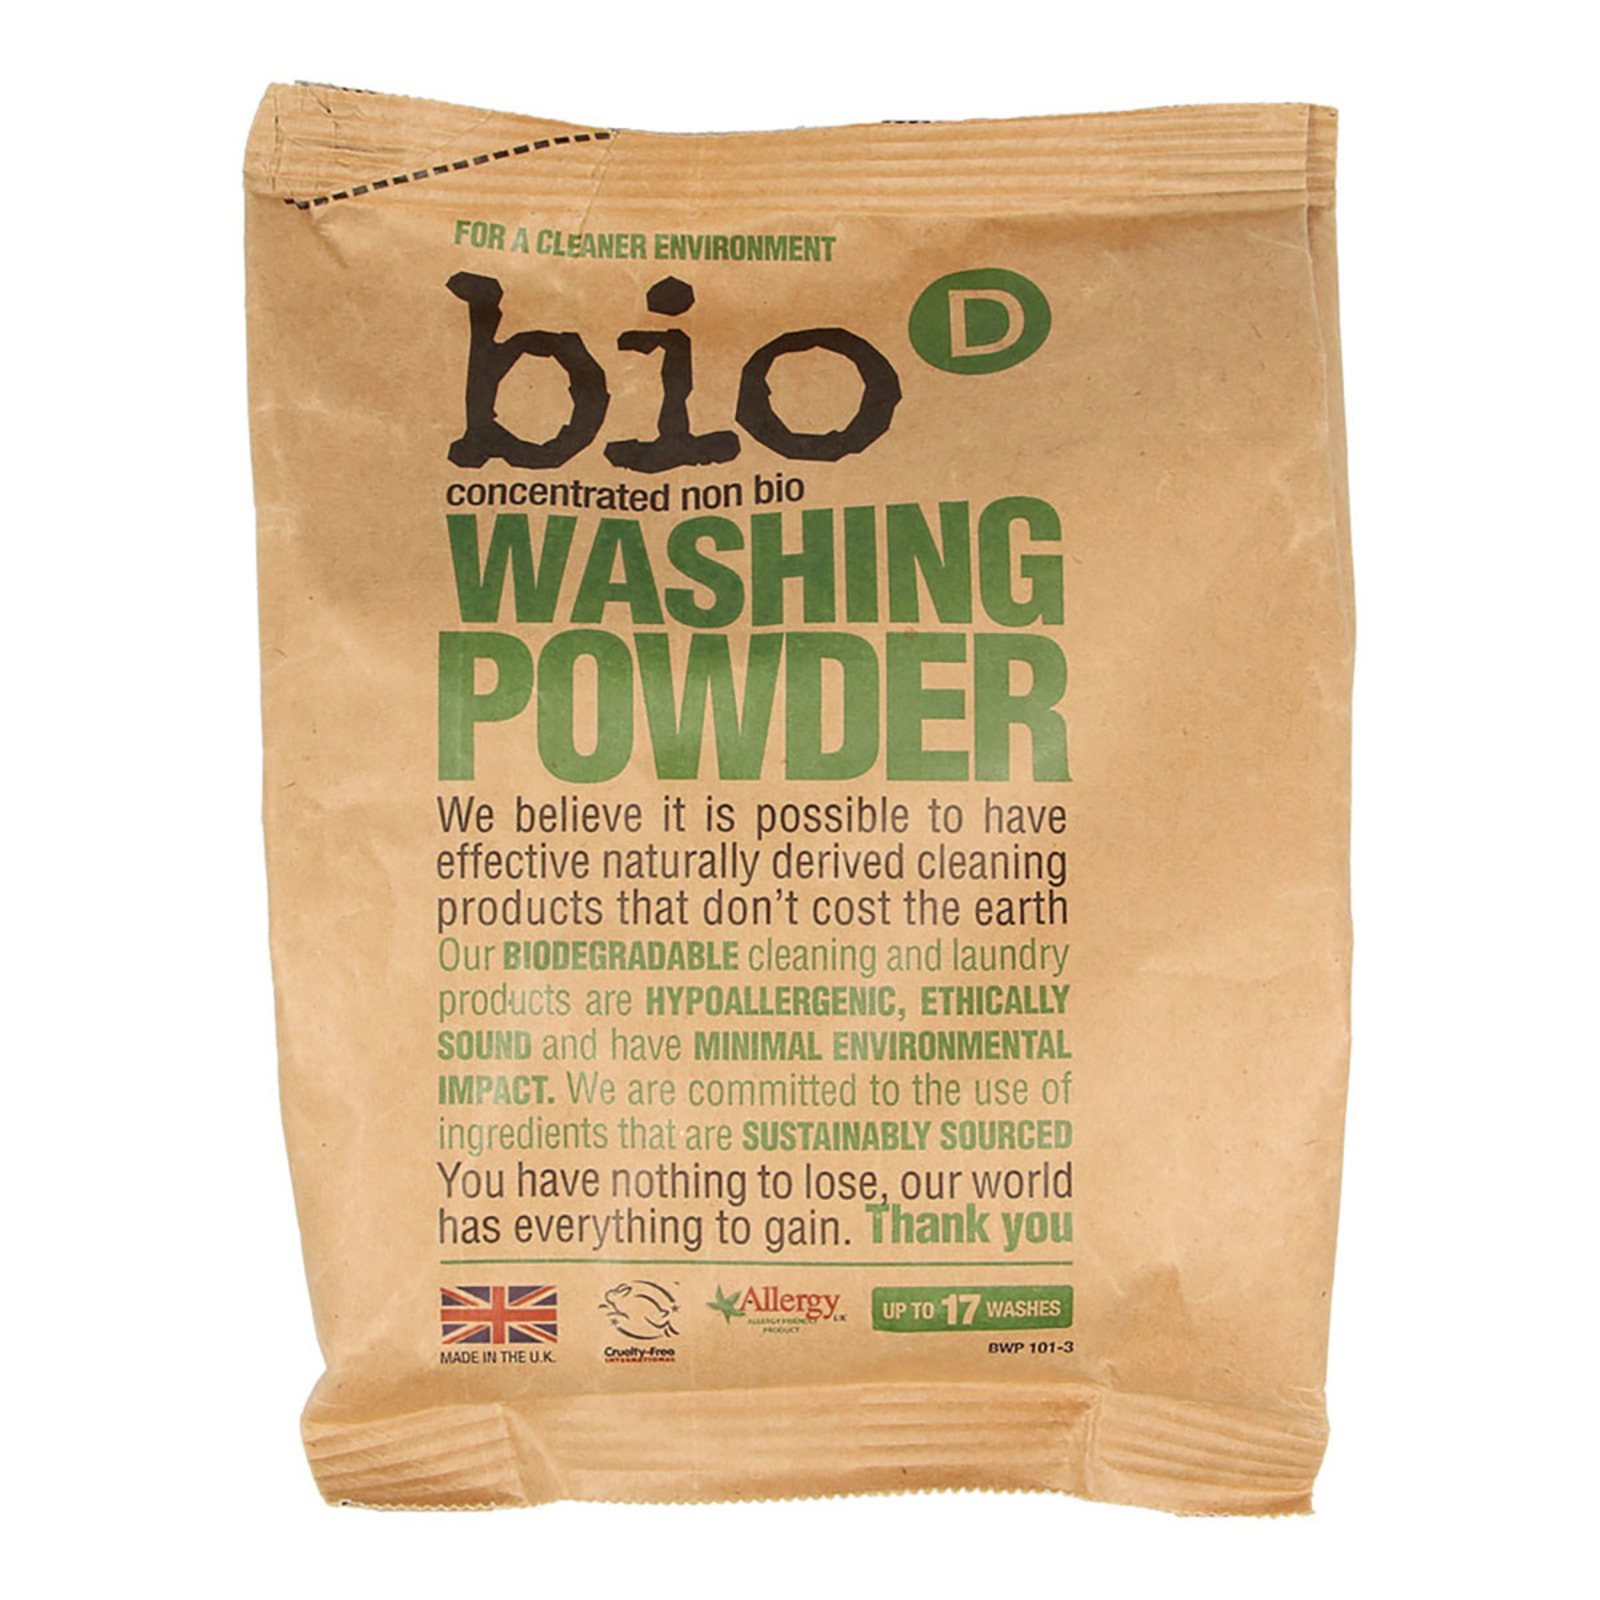 Bio D Washing Powder (1kg) - By Wholesome Harvest